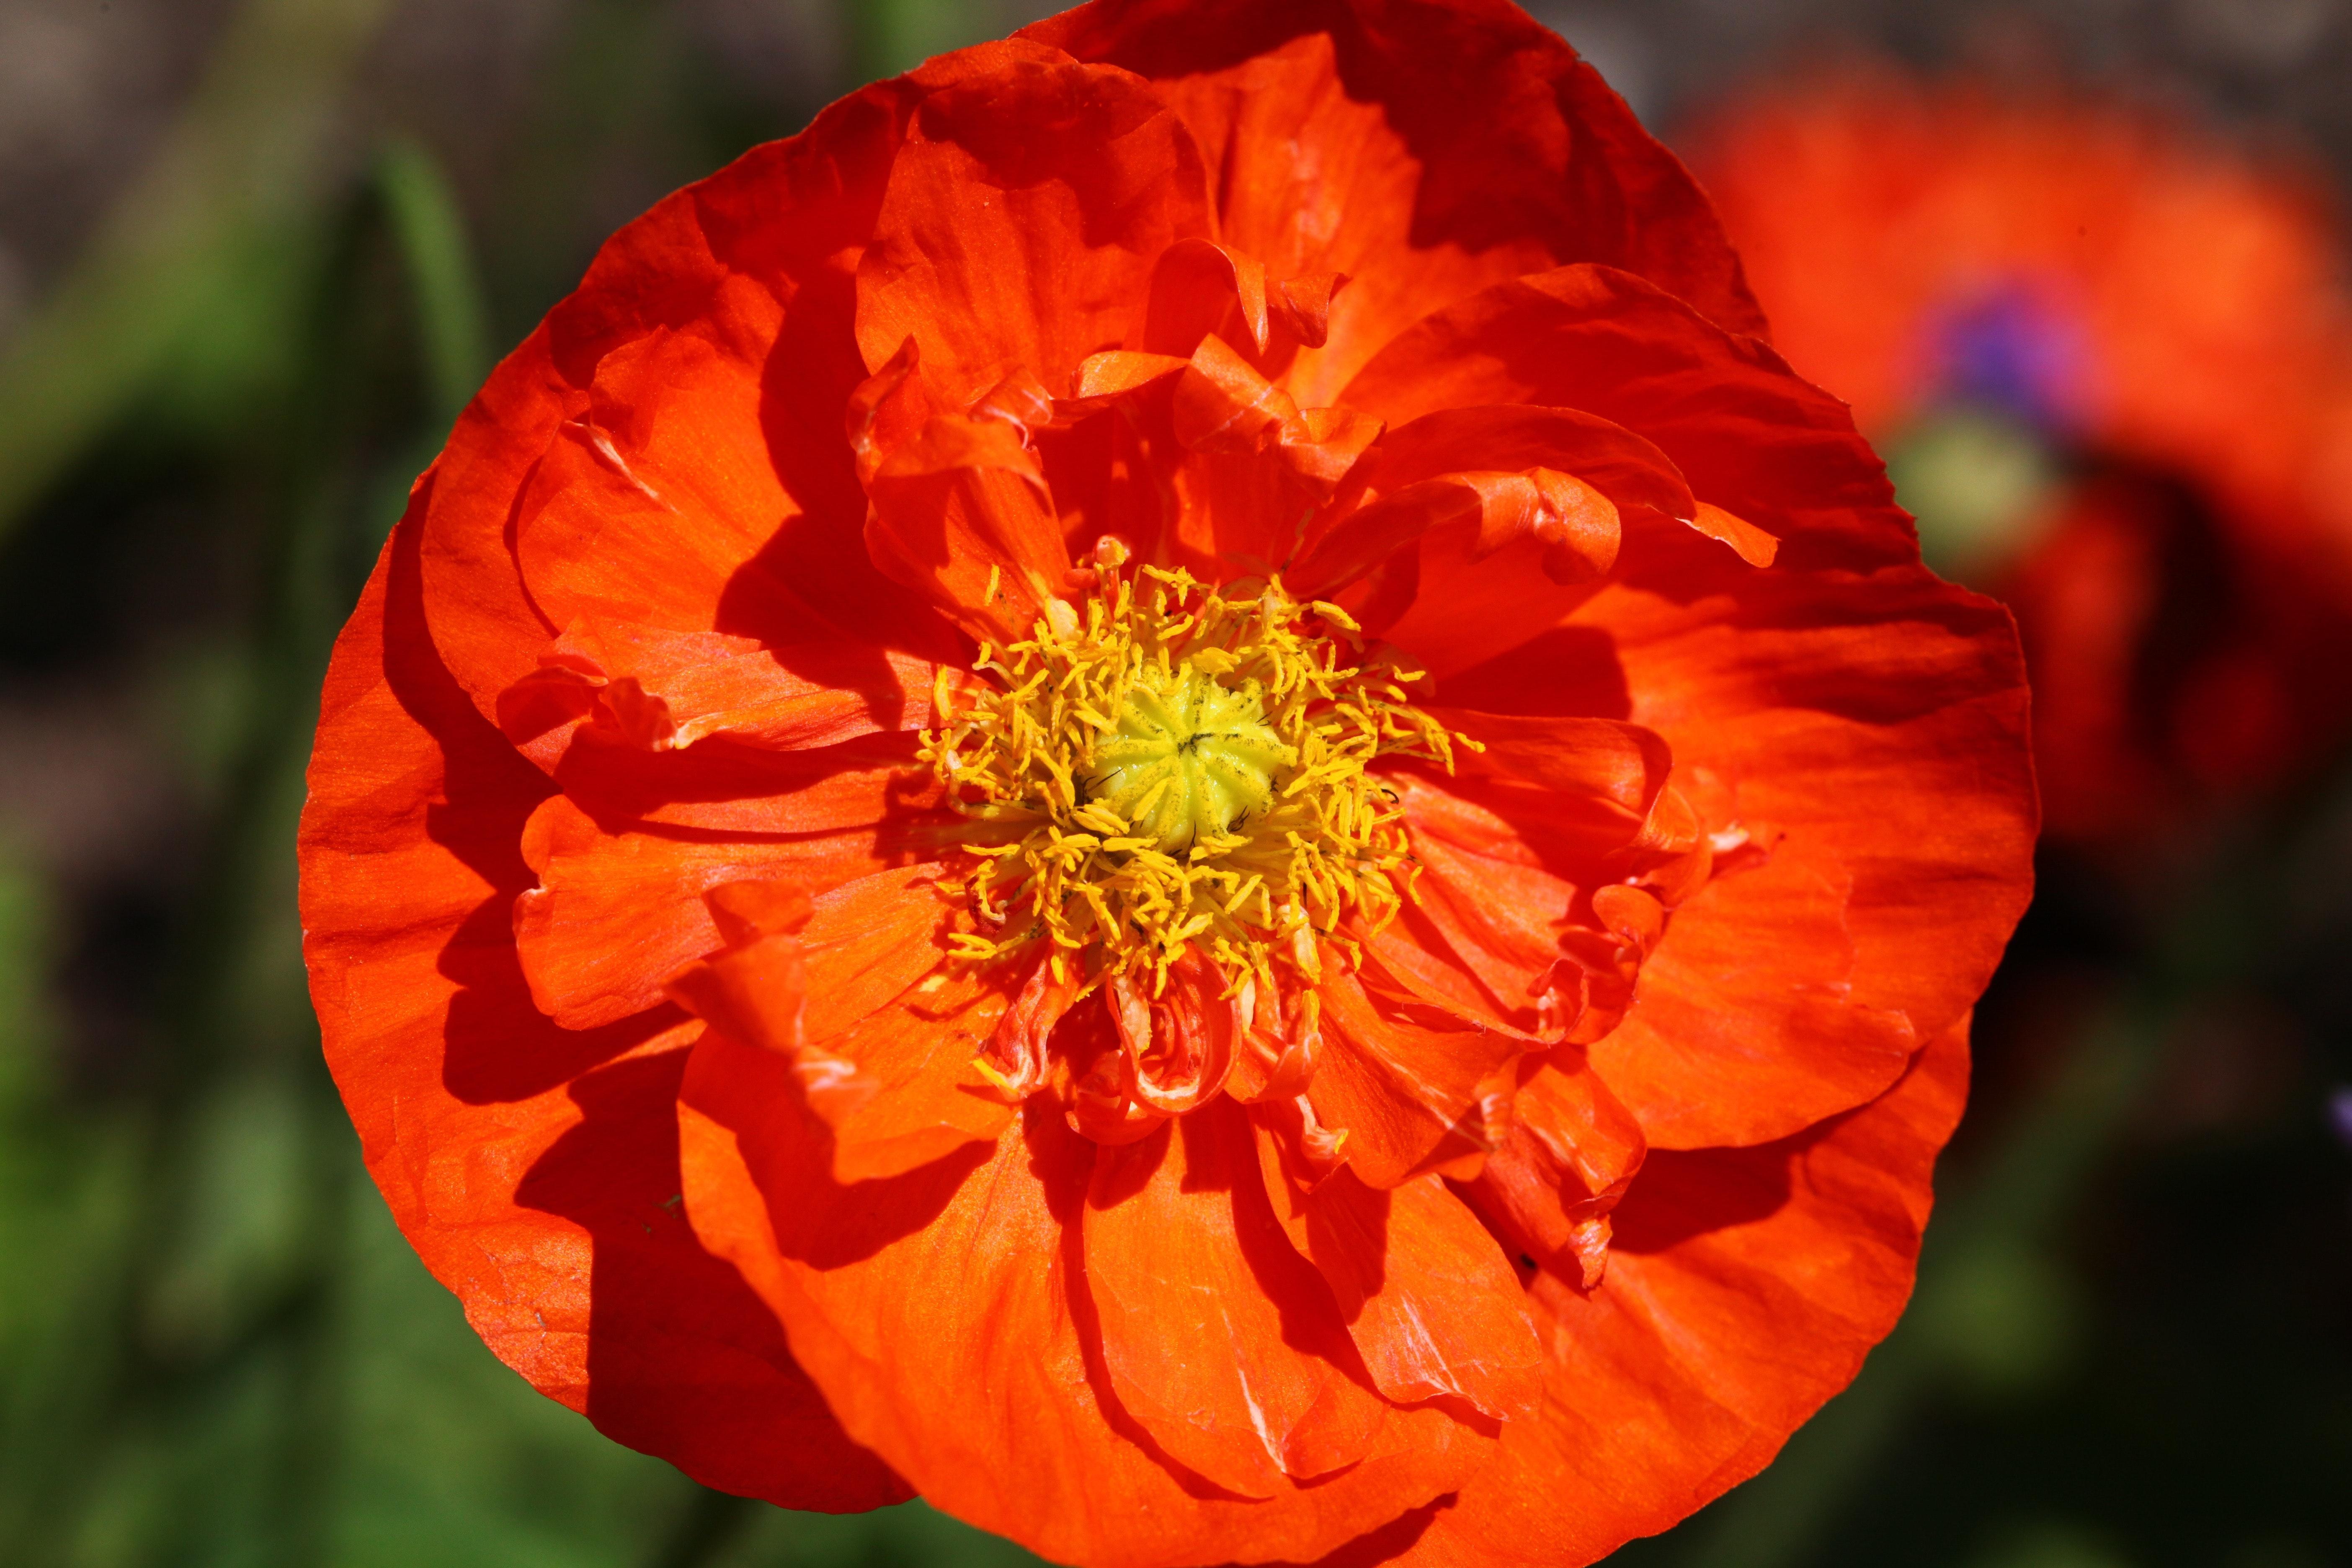 Orange Flower With Yellow Petals, Nature, Orange, Plant, Poppy, HQ Photo